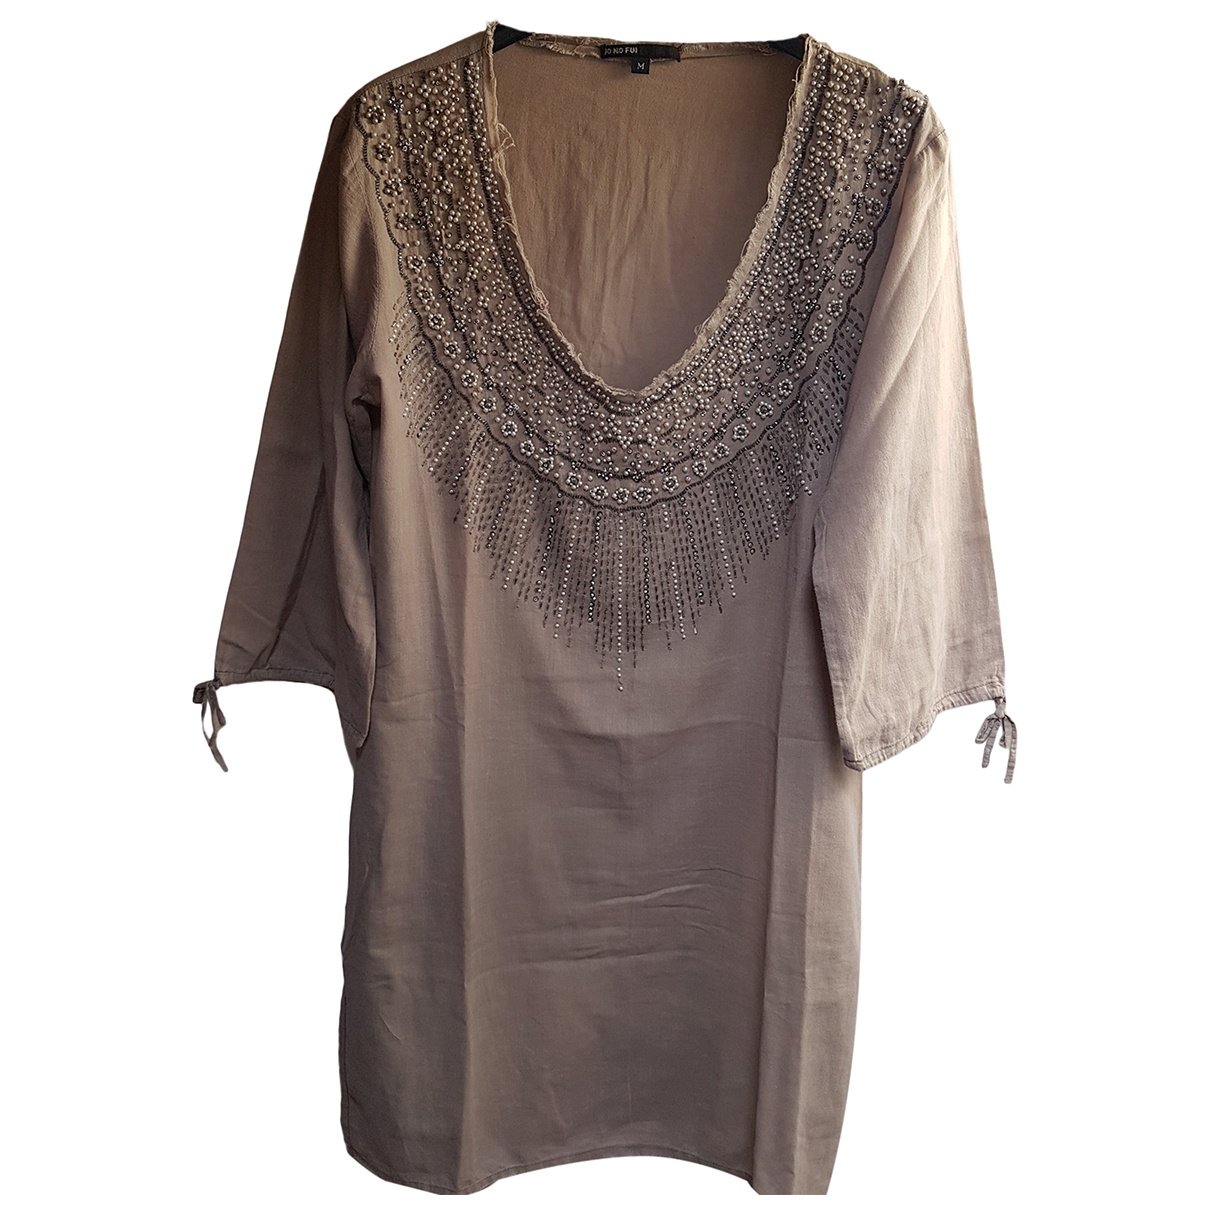 Autre Marque N Beige Cotton dress for Women M International